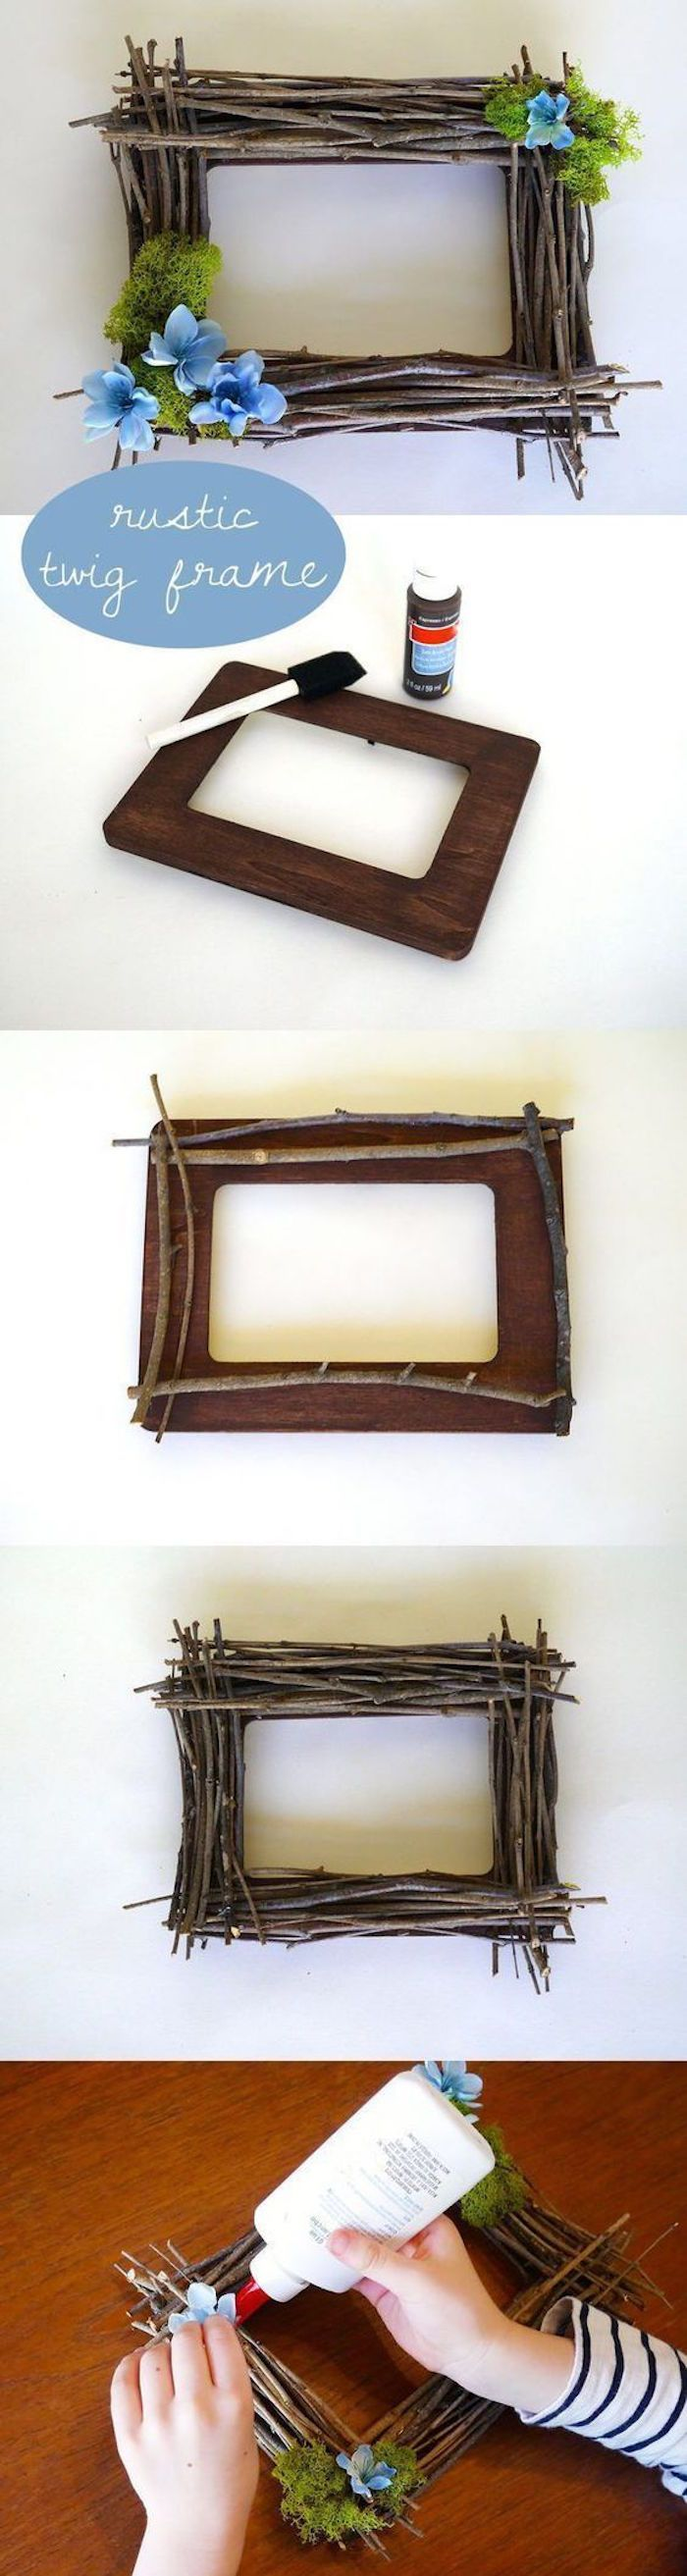 DIY Deko Idee, Rahmen aus Holz basteln (Try Art)